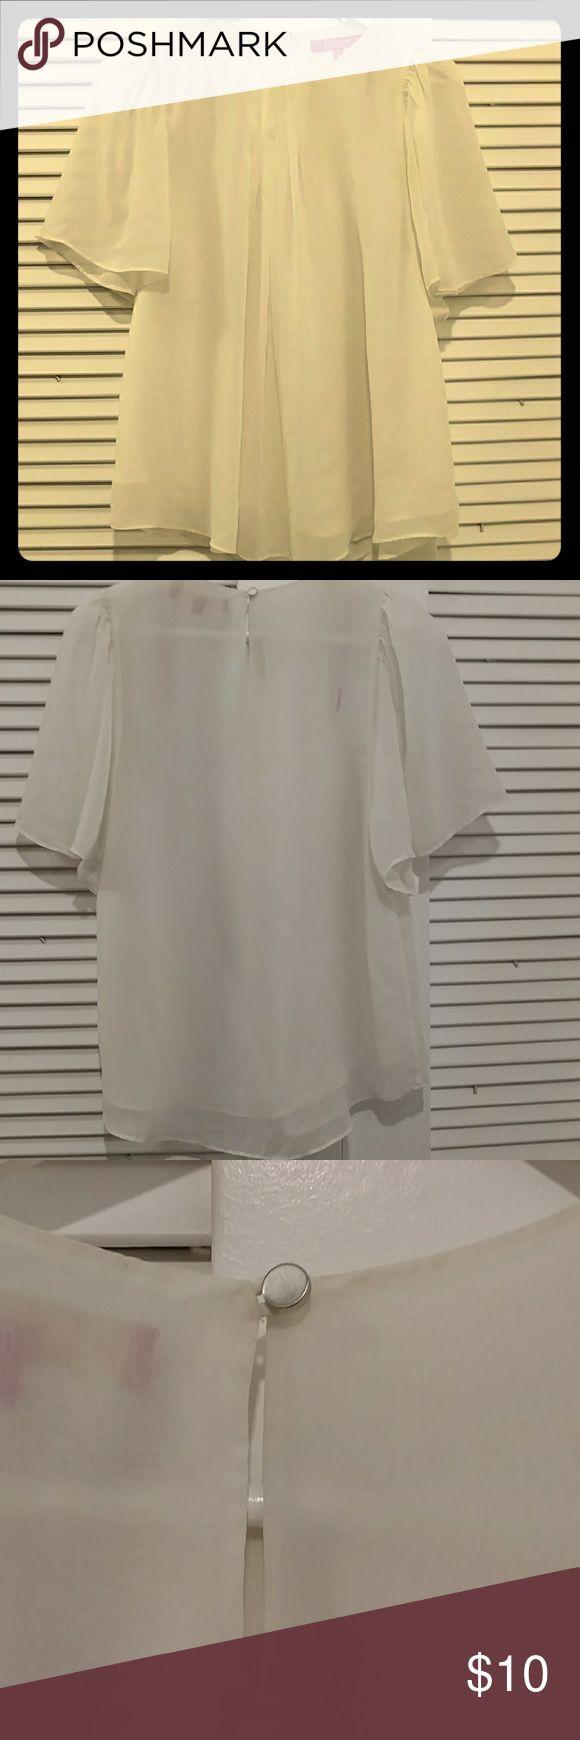 Cream blouse Flowy, cream blouse. Catherine Malandrino Tops Blouses